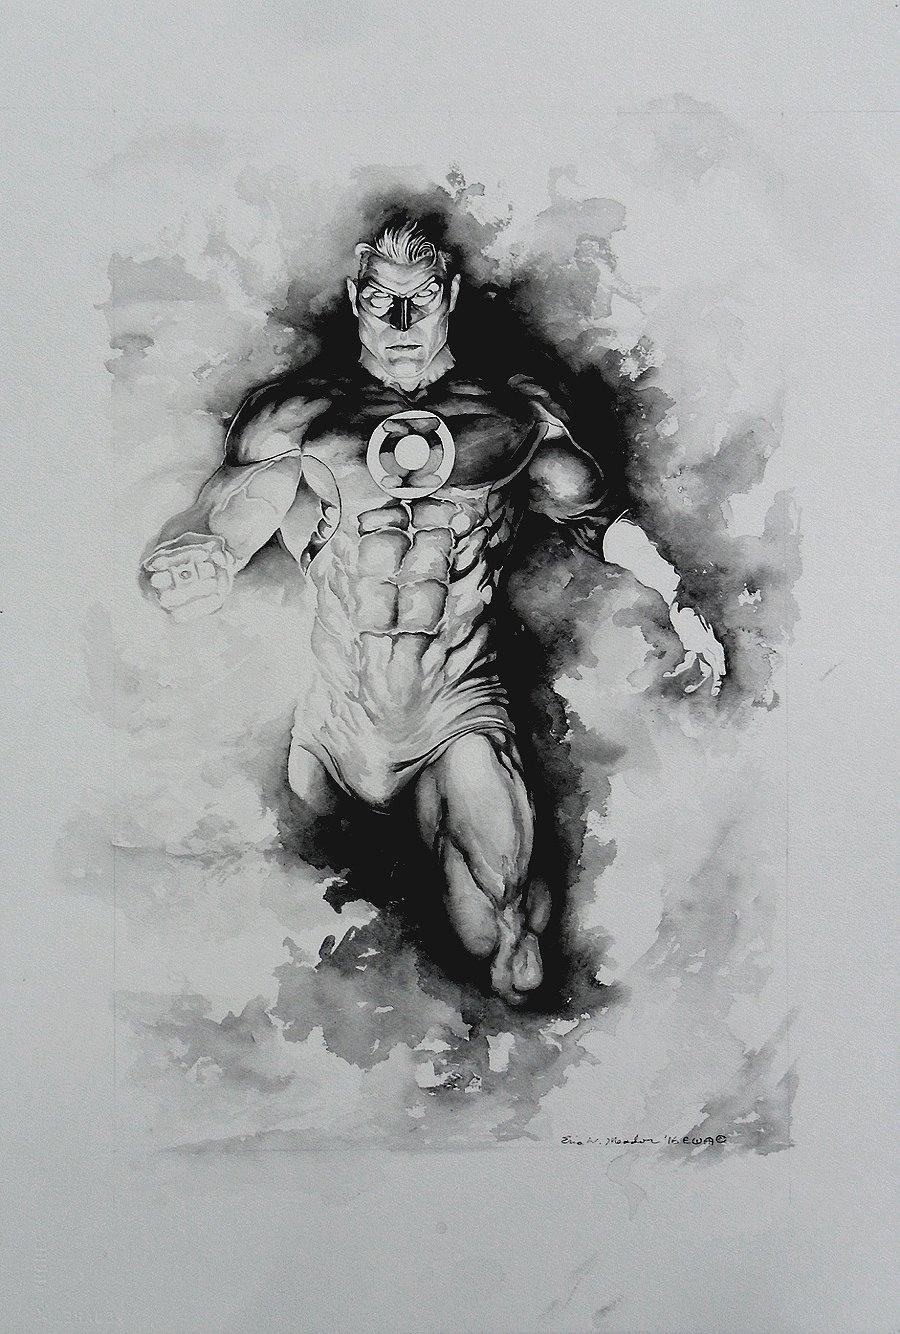 Green Lantern Commission Pinup! WOW! (Large Art) 2016